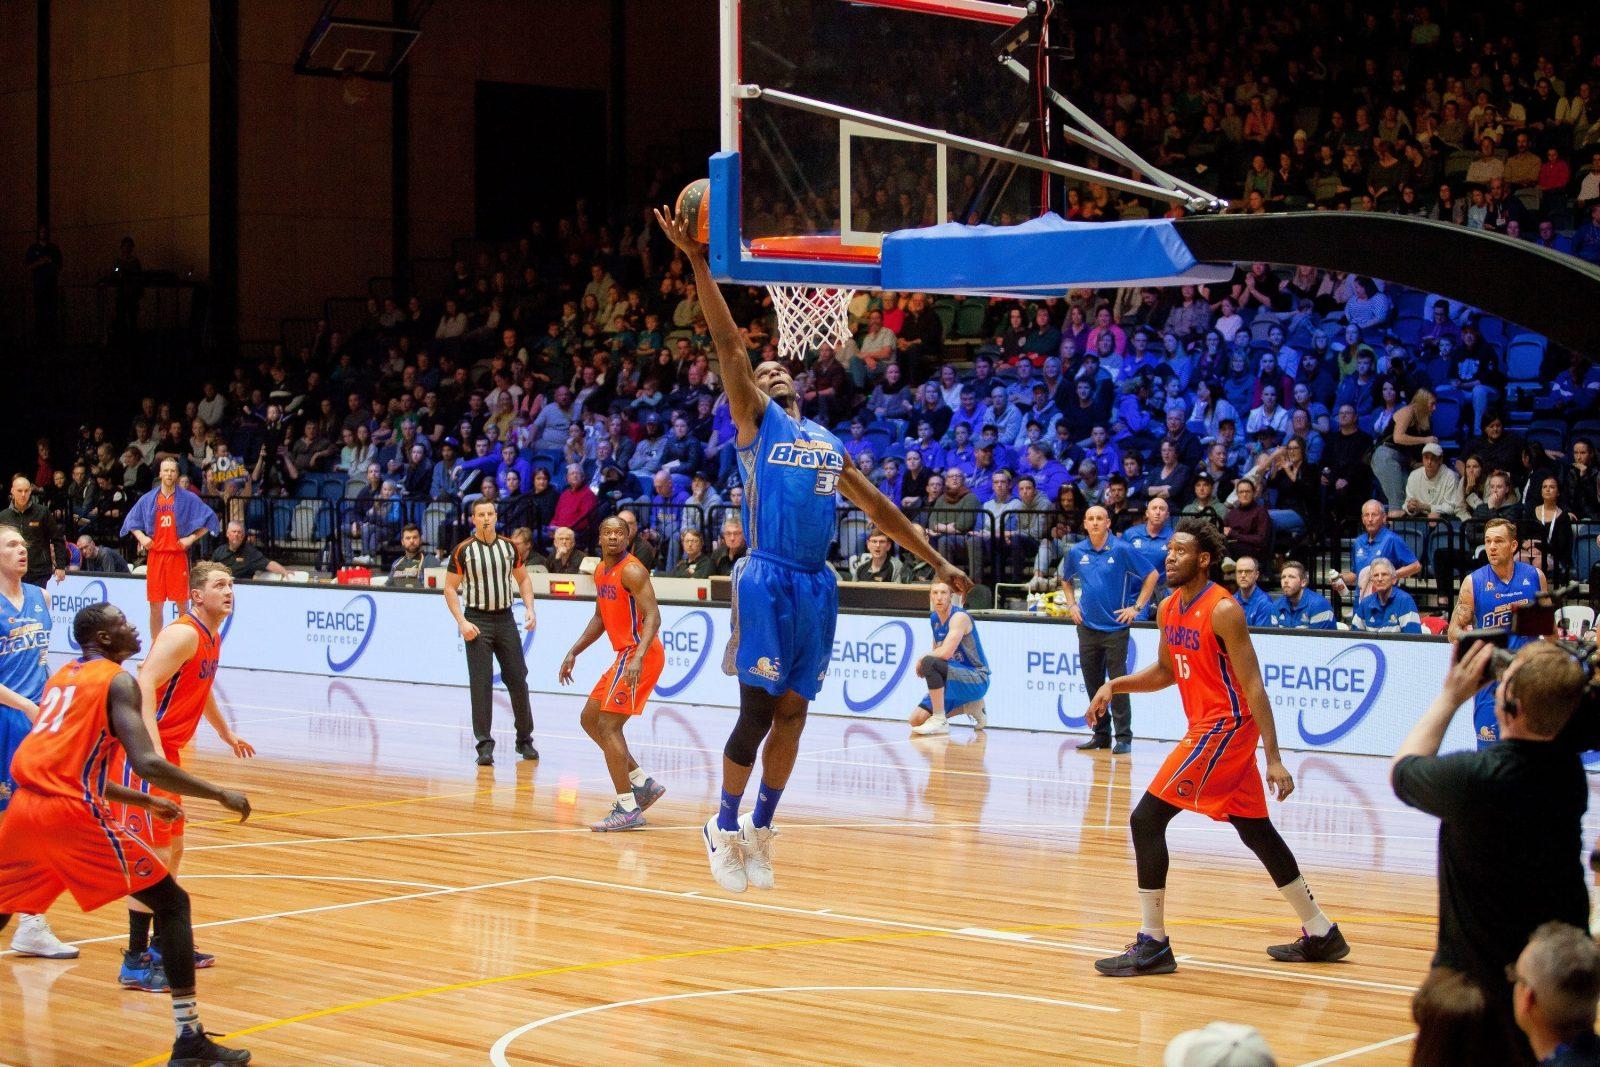 Bendigo Stadium Basketball